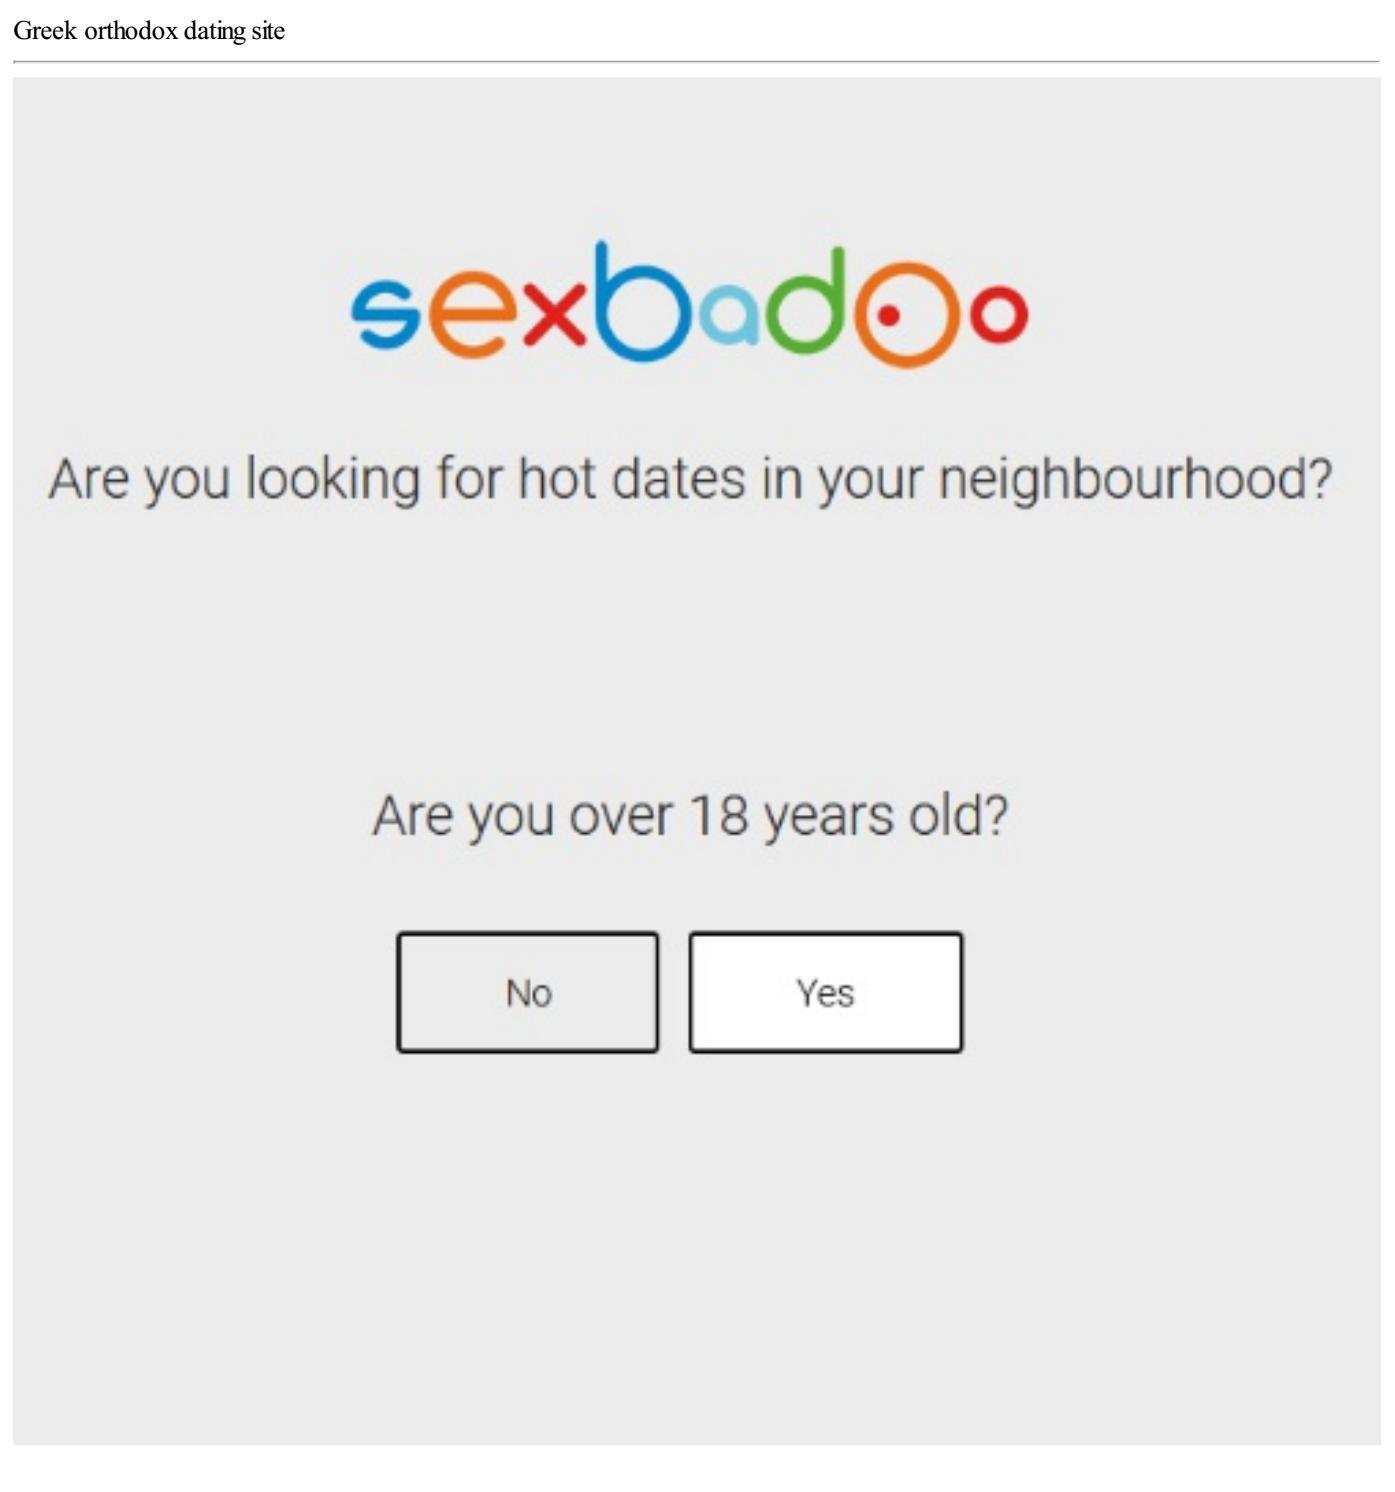 greek orthodox dating sites